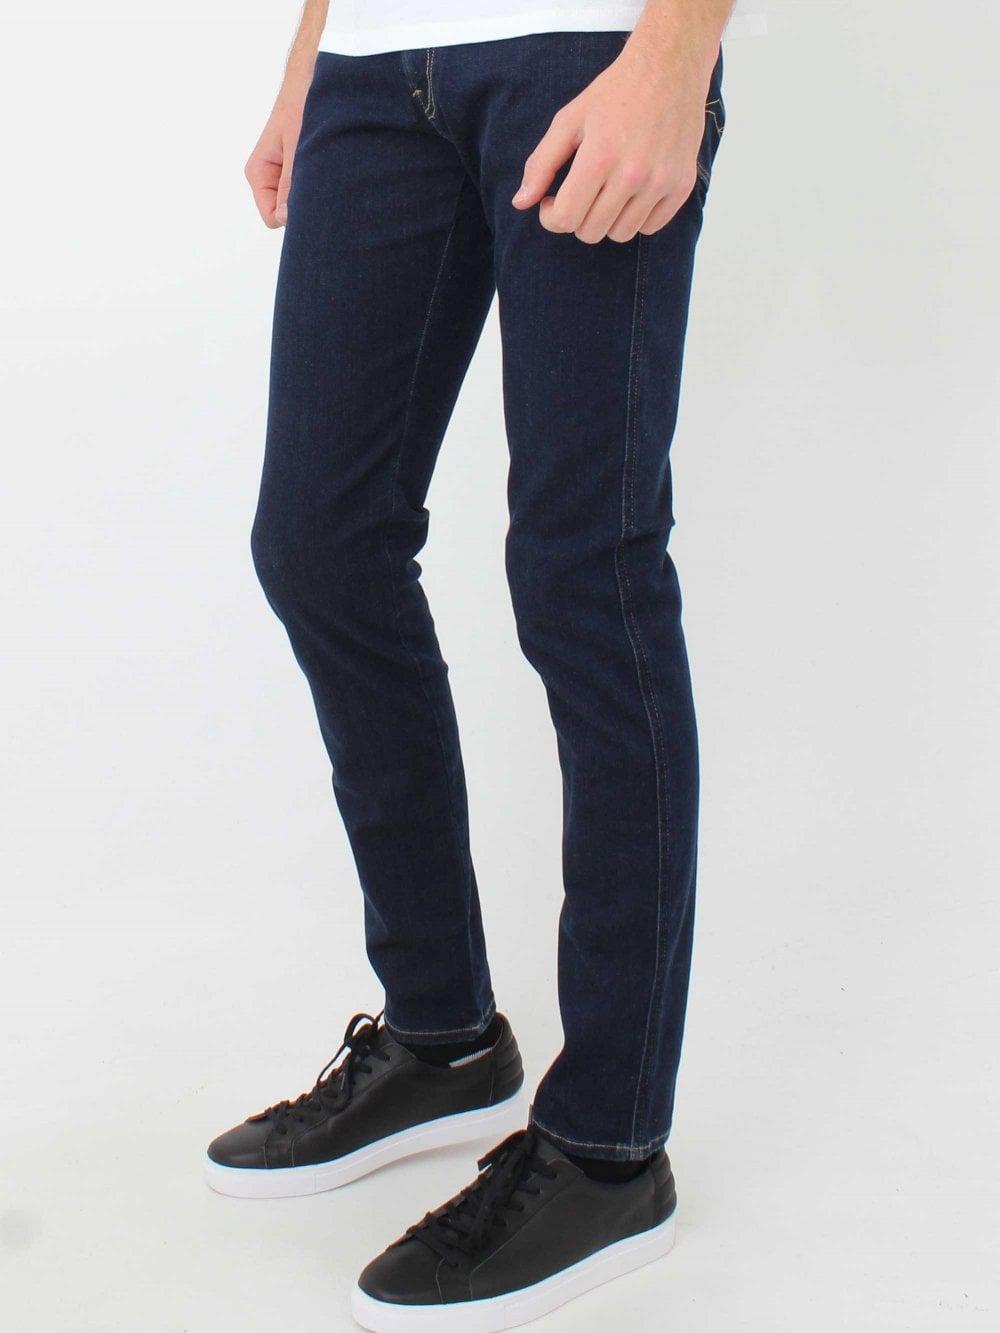 05d5e38b8 Replay Anbass Hyperflex Jeans in Dark Blue | Northern Threads